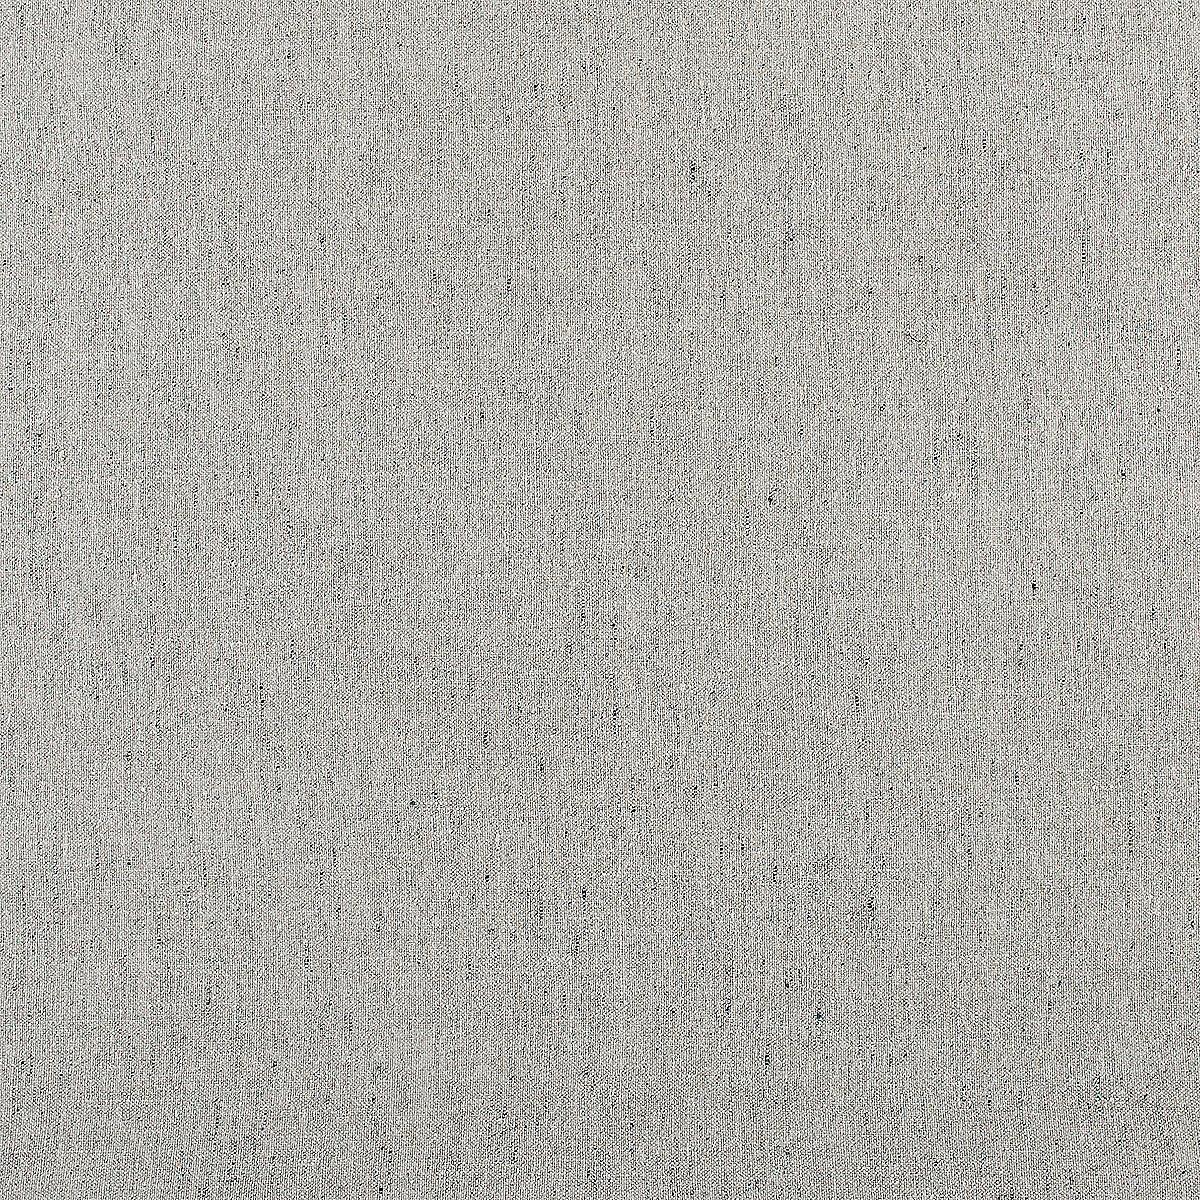 French Linen: Natural (fabric yardage)